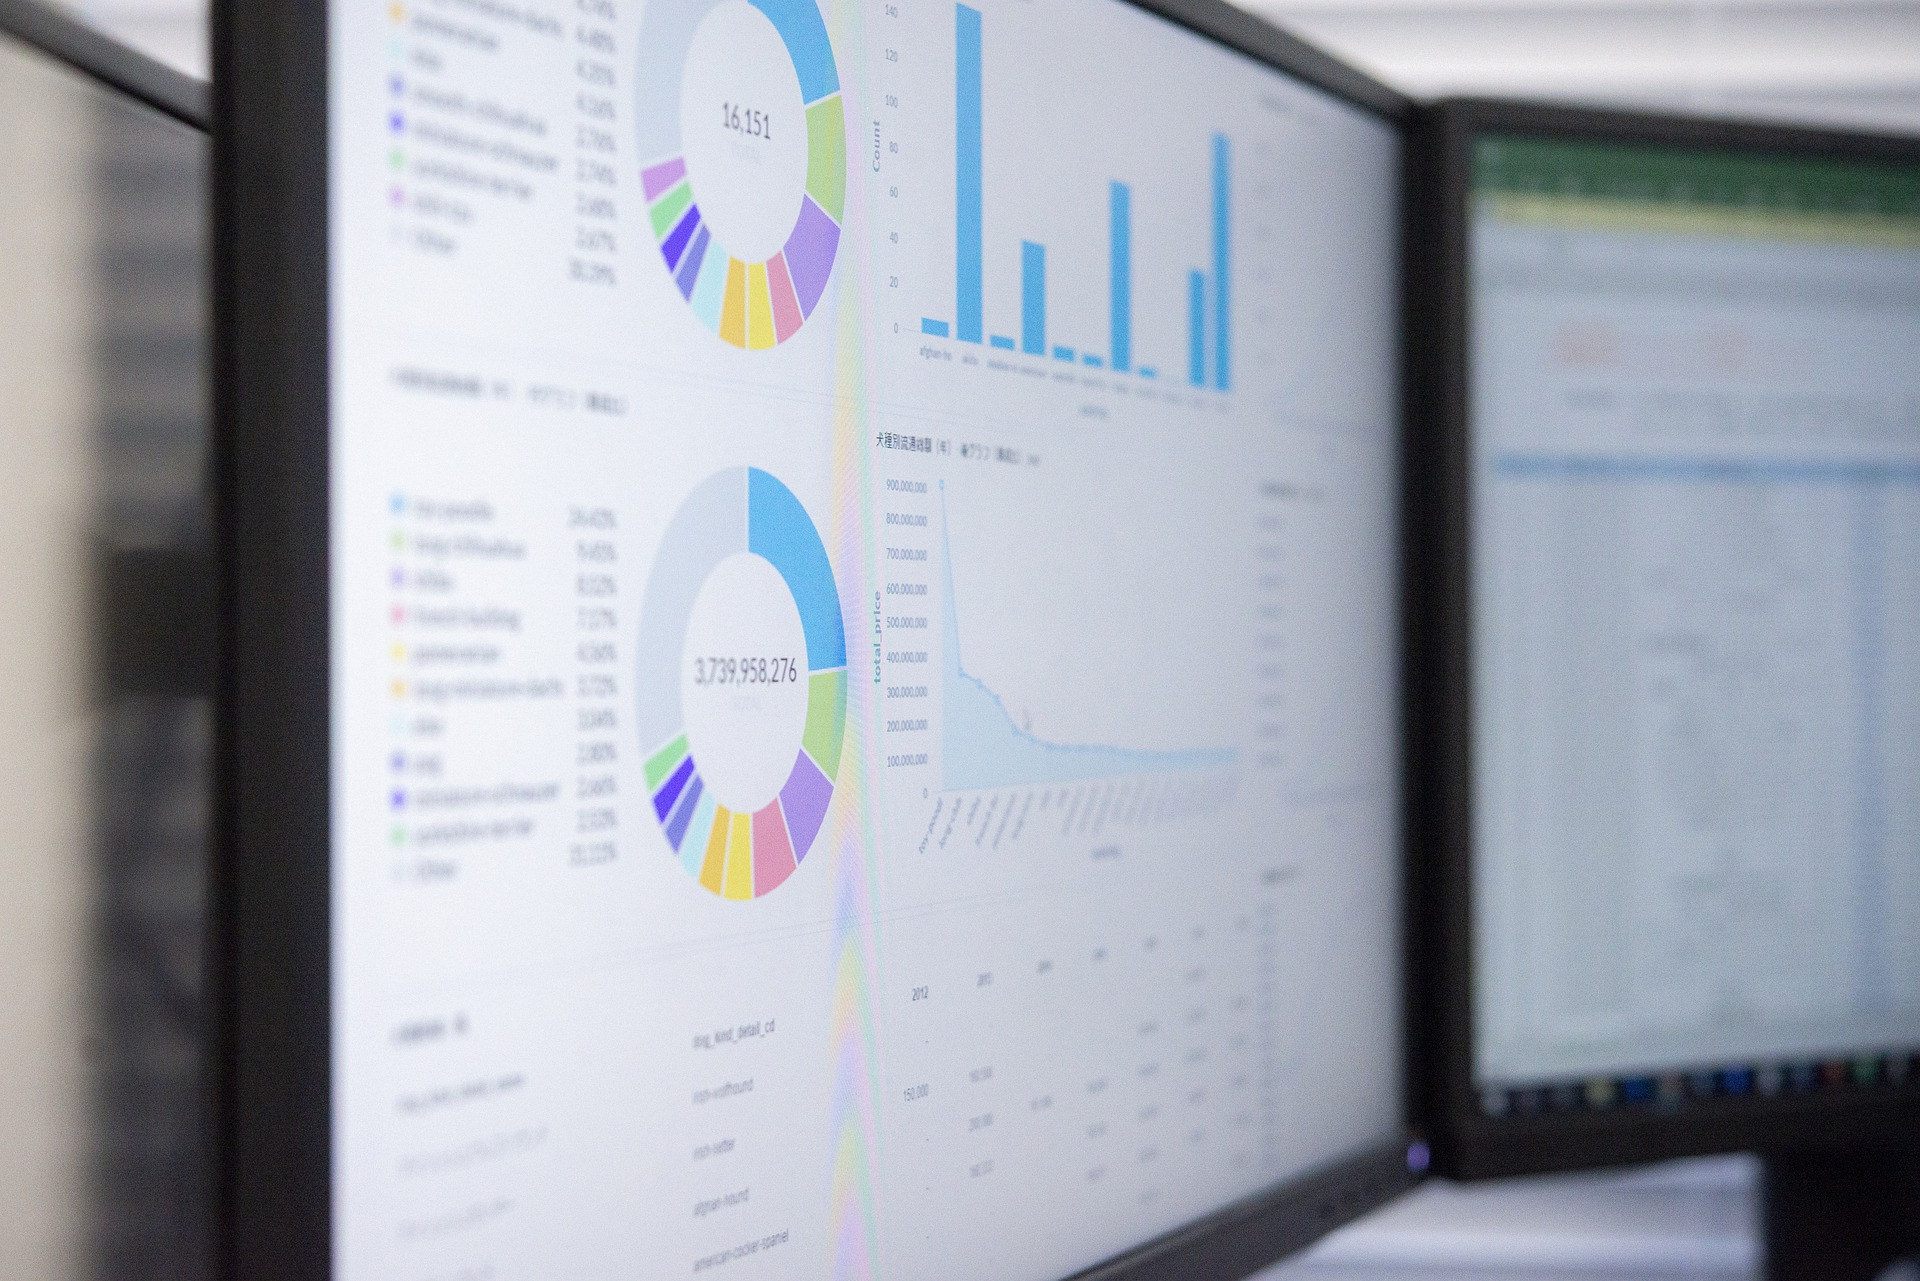 Illustration of visualization in business intelligence